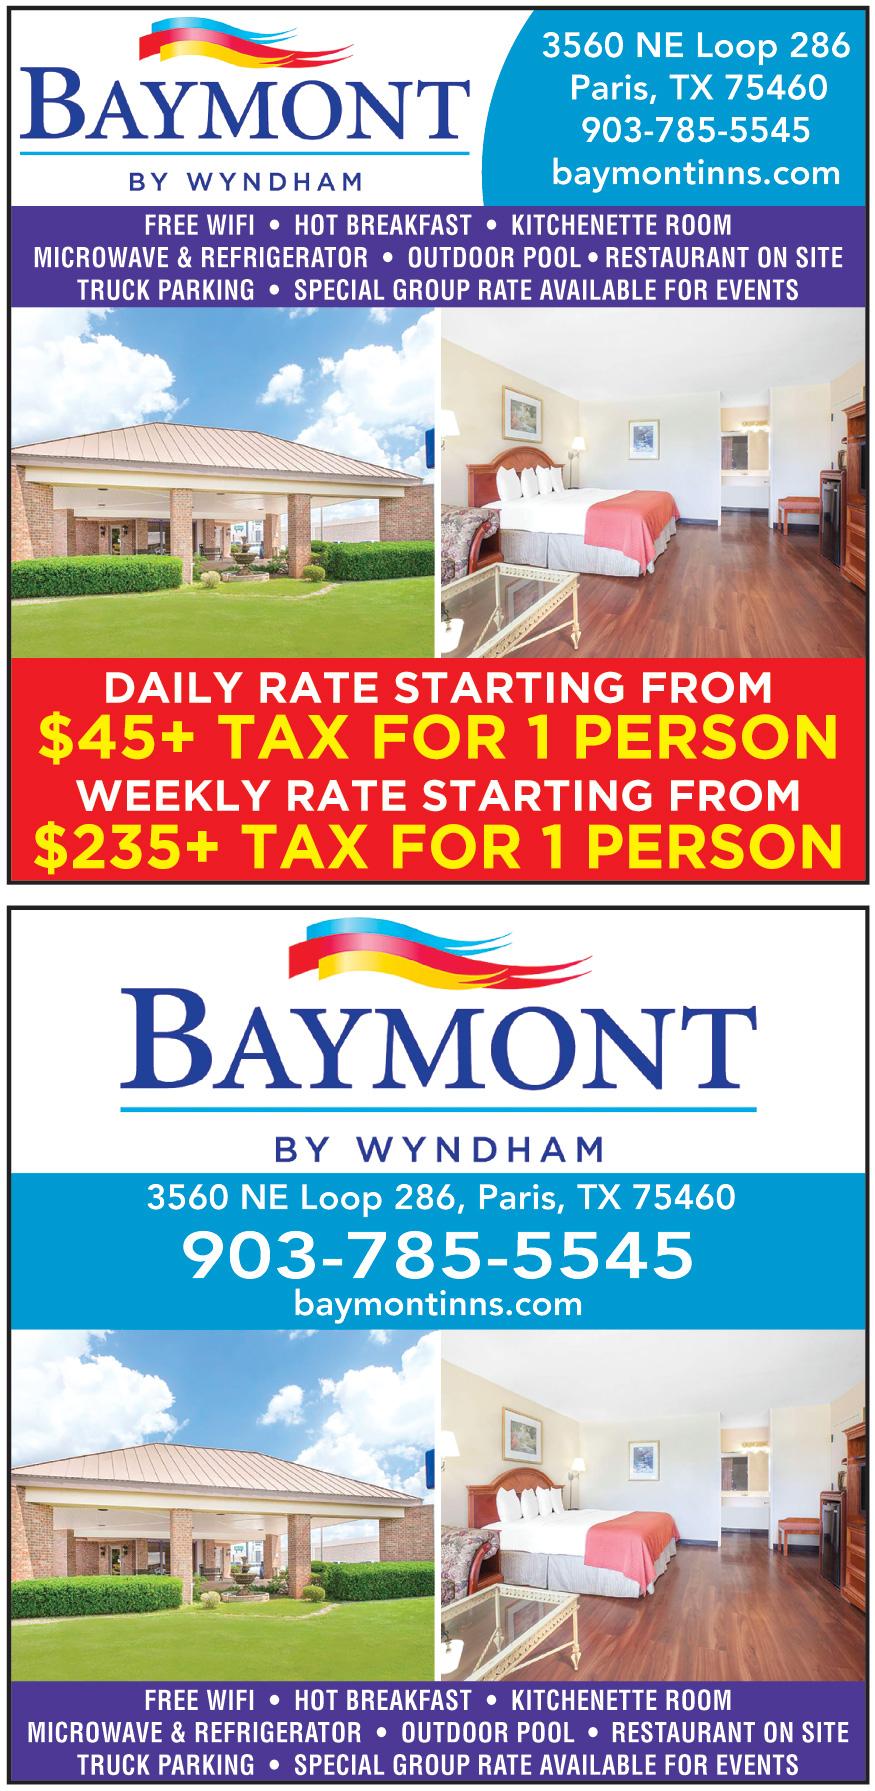 BAYMONT BY WYNDHAM PARIS